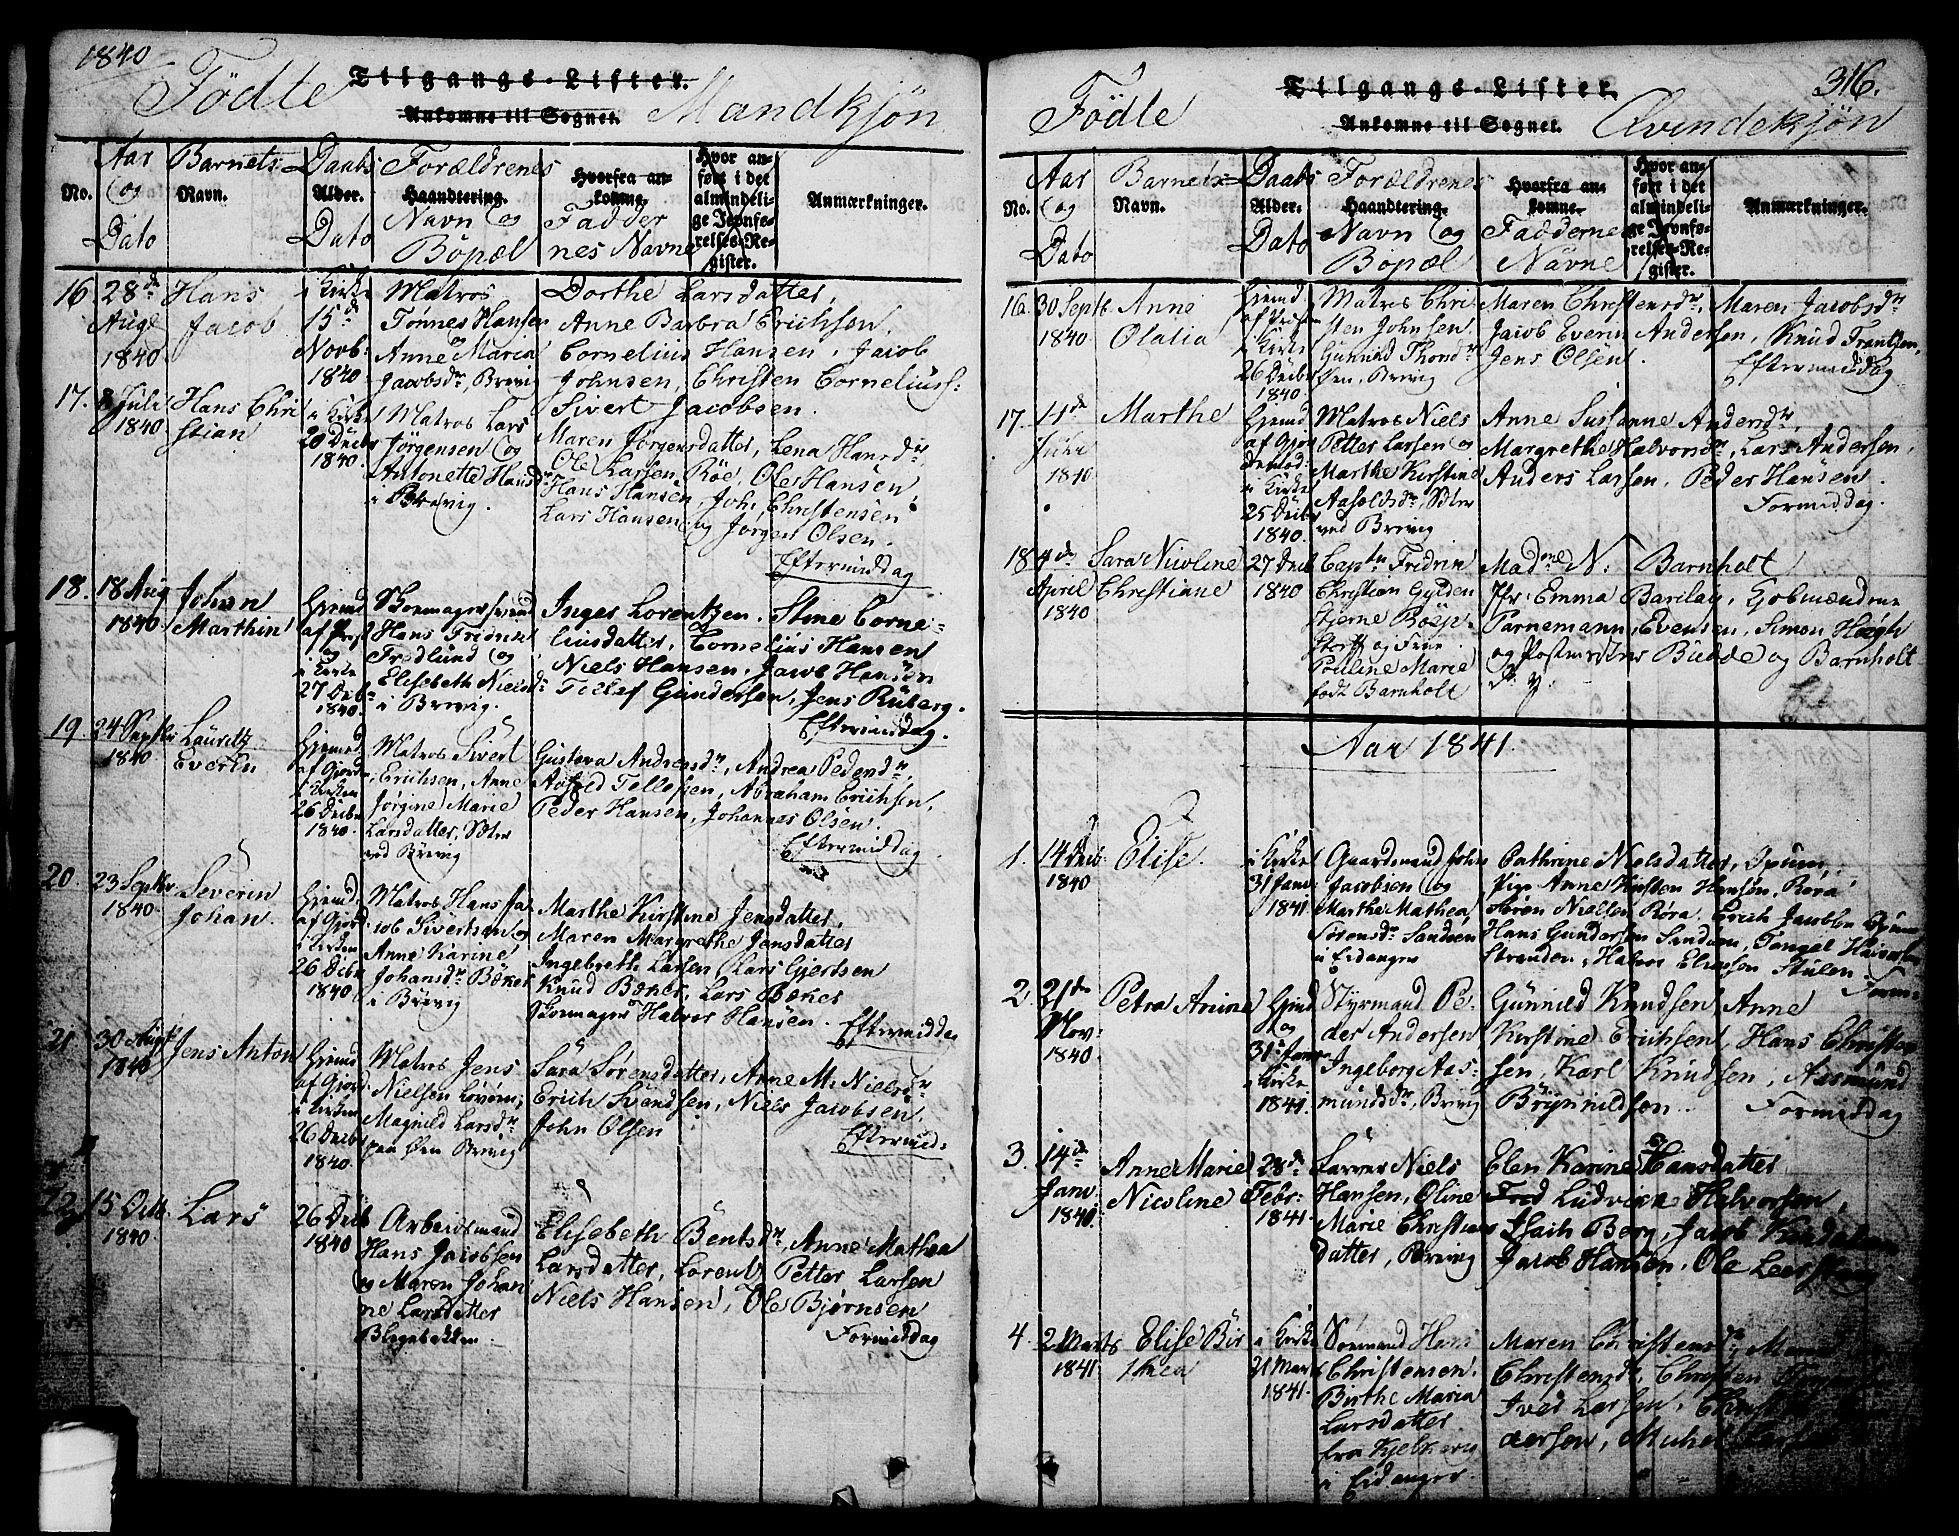 SAKO, Brevik kirkebøker, G/Ga/L0001: Klokkerbok nr. 1, 1814-1845, s. 316